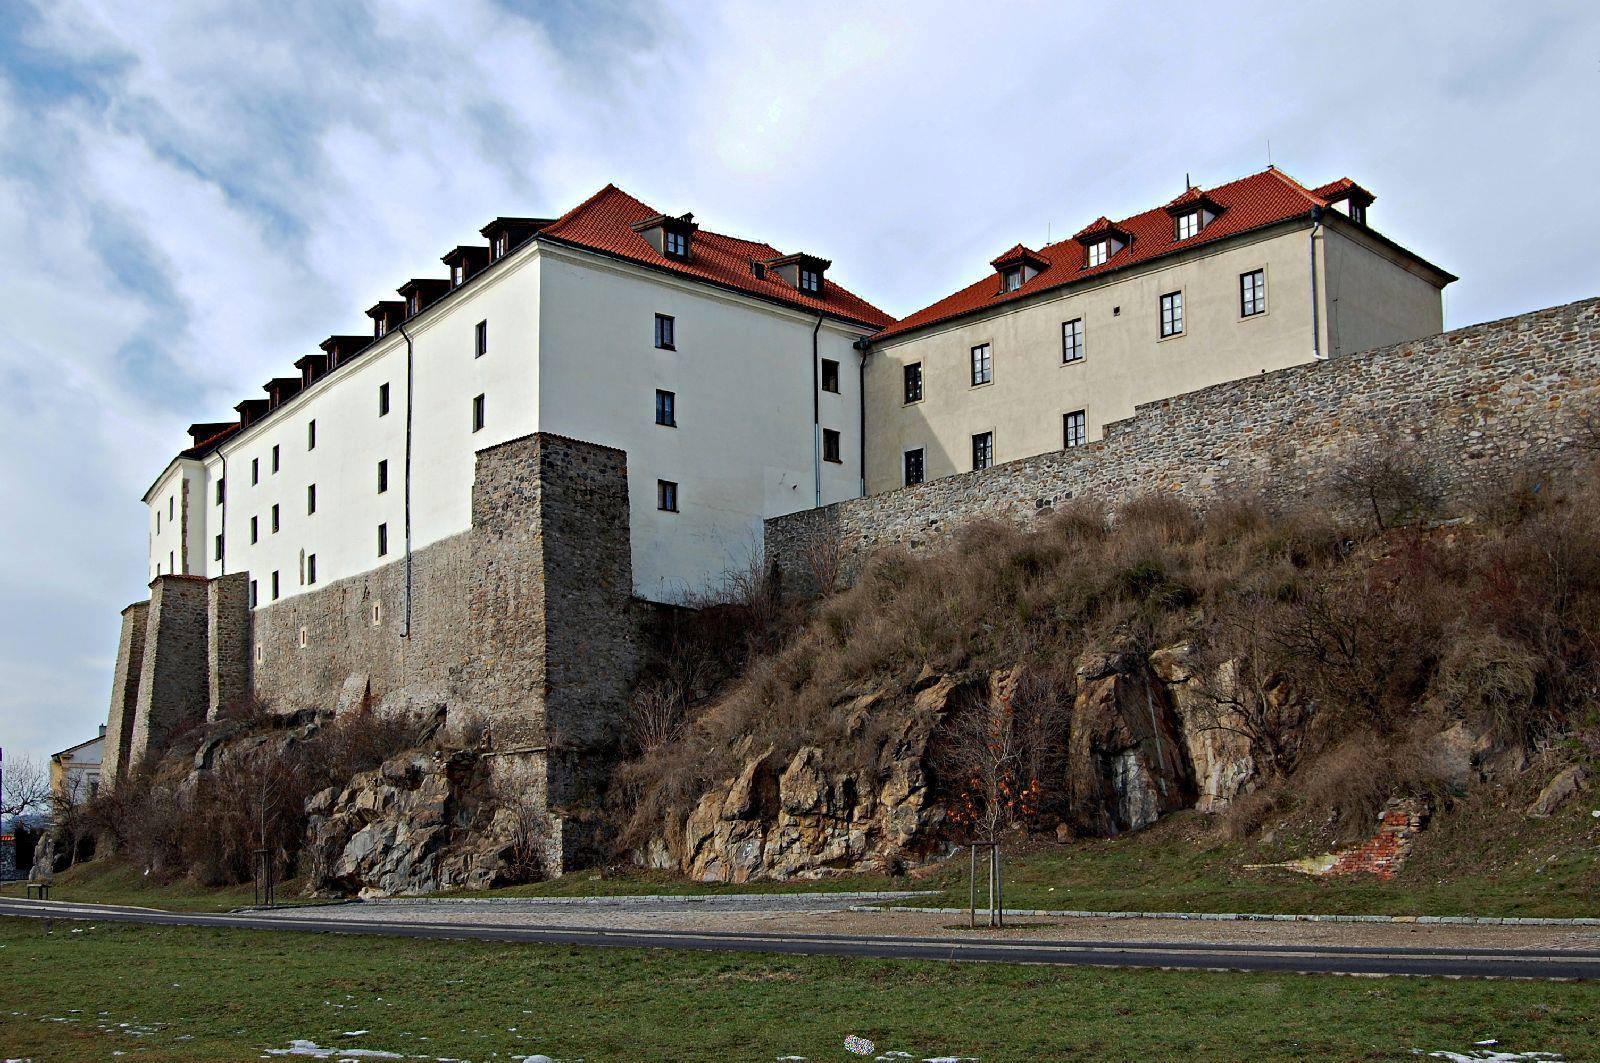 Hrad Kadaň